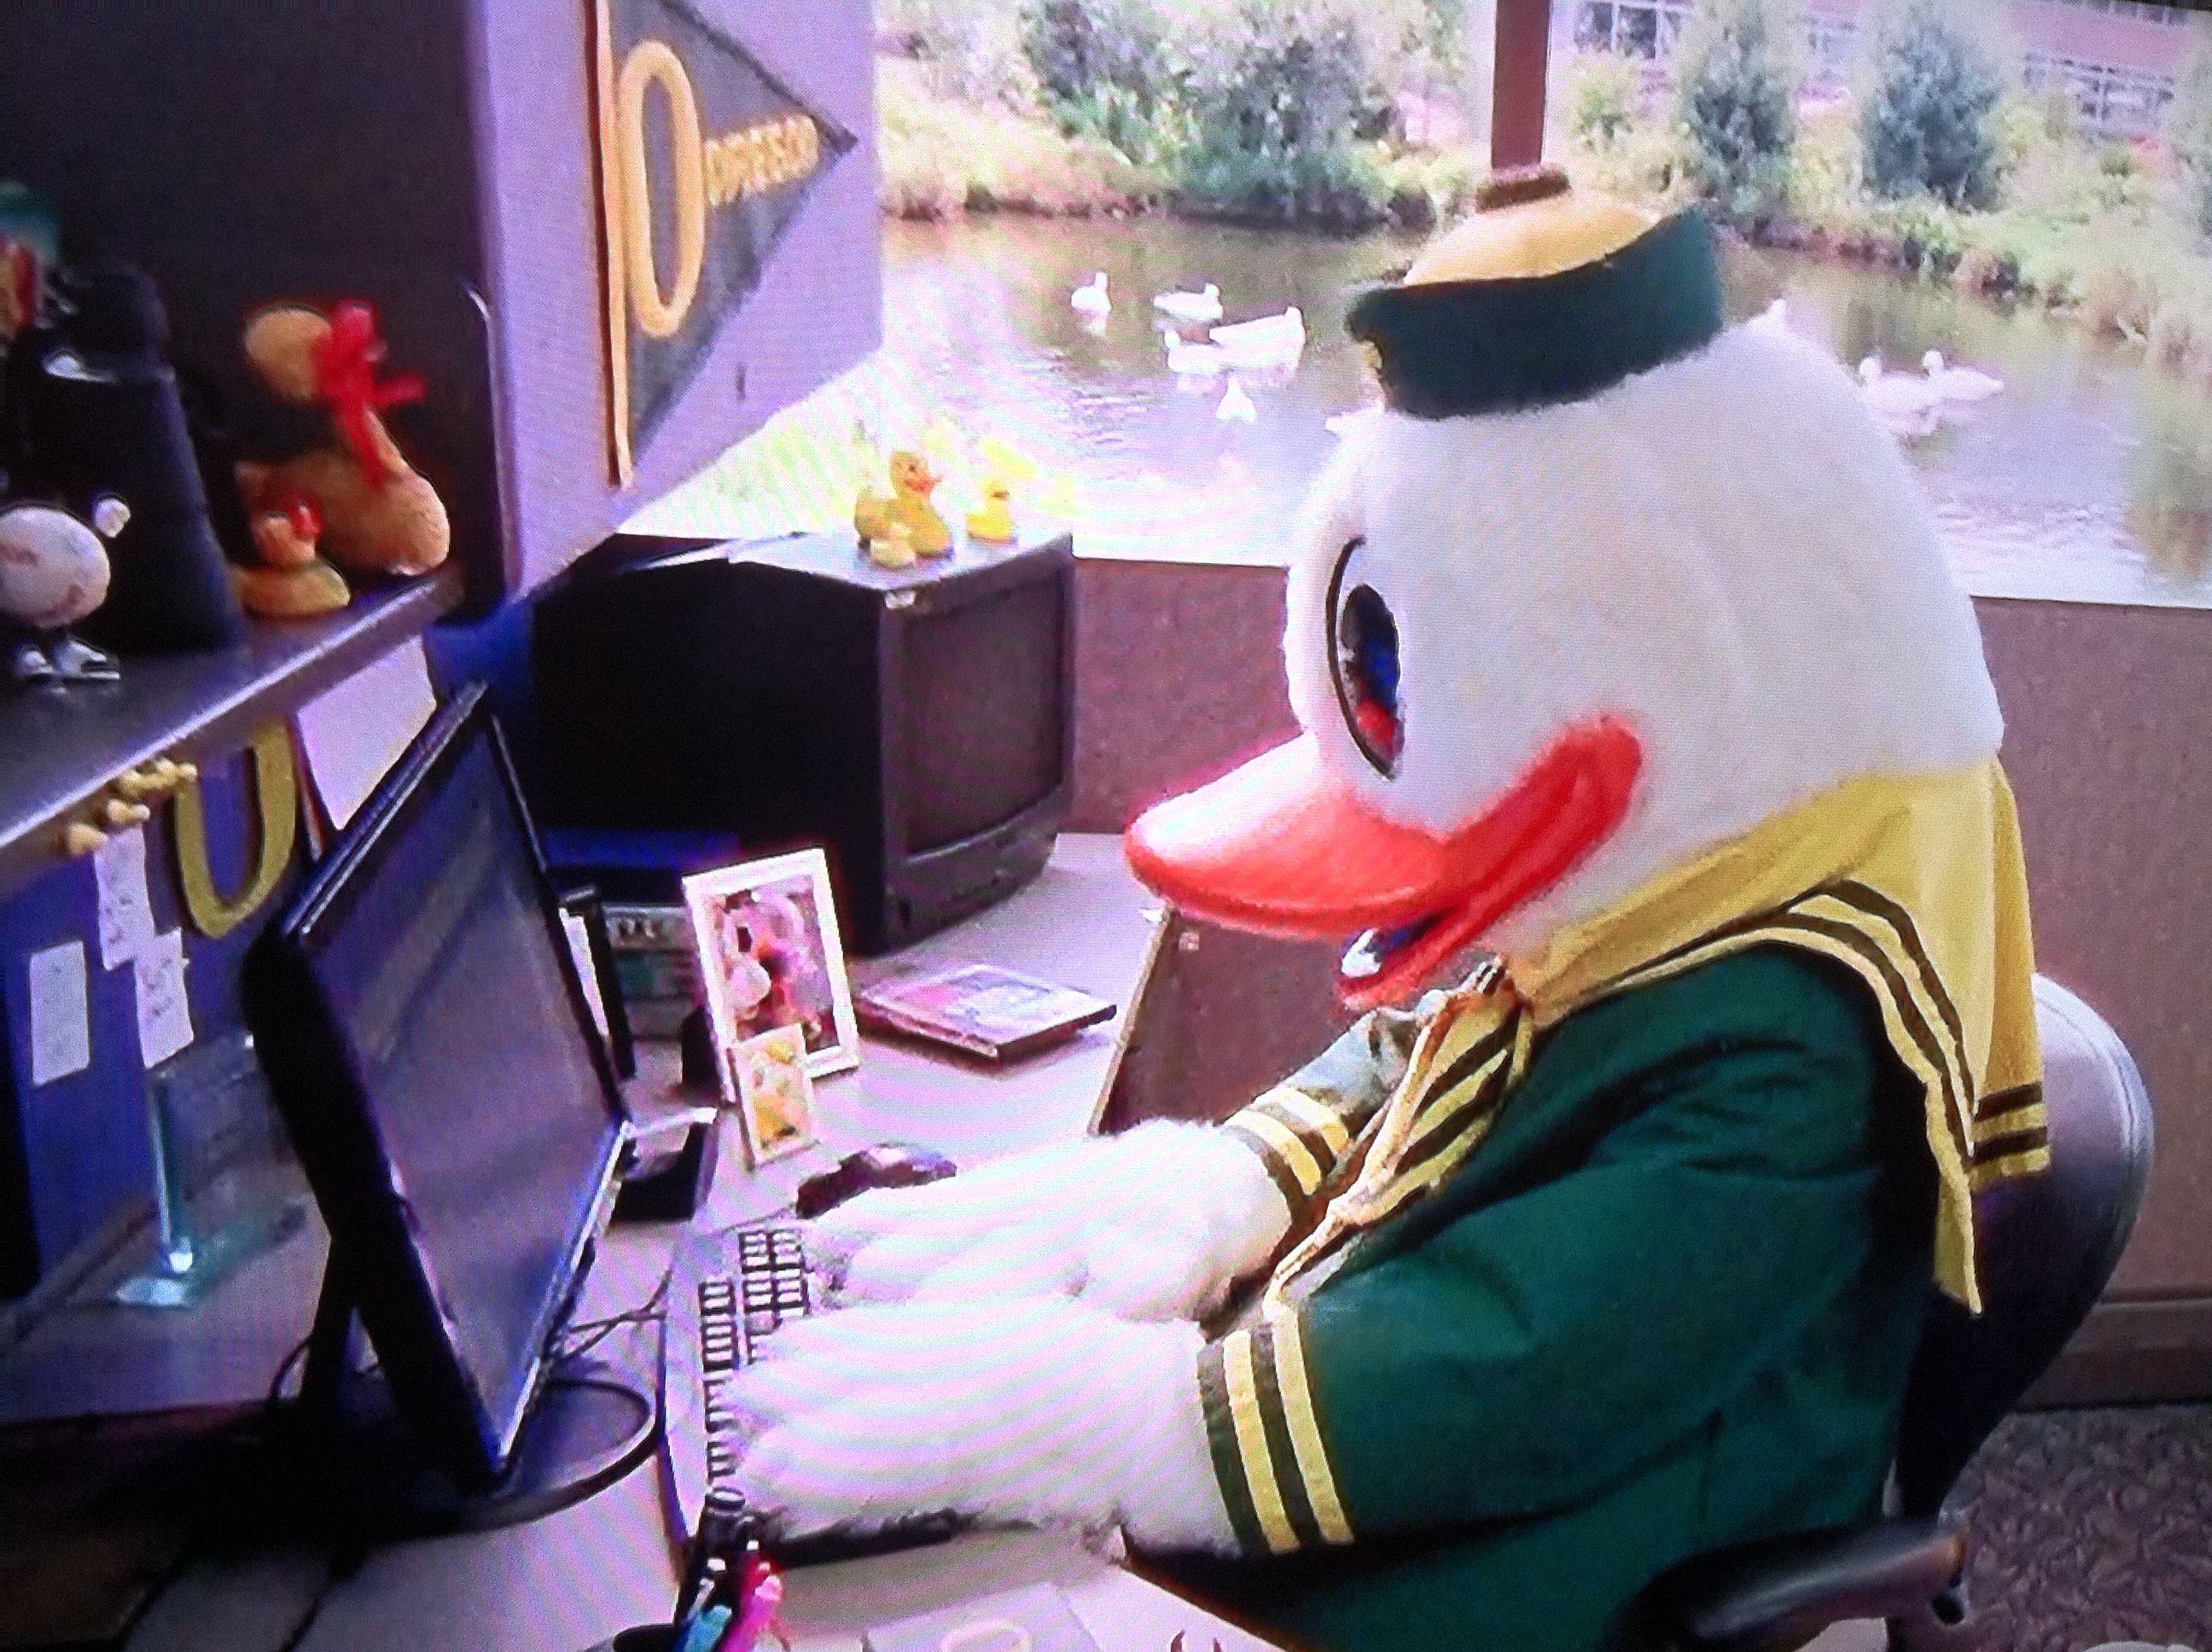 The Oregon Duck University Of Oregon Ducks Oregon Ducks Oregon Ducks Football University Of Oregon